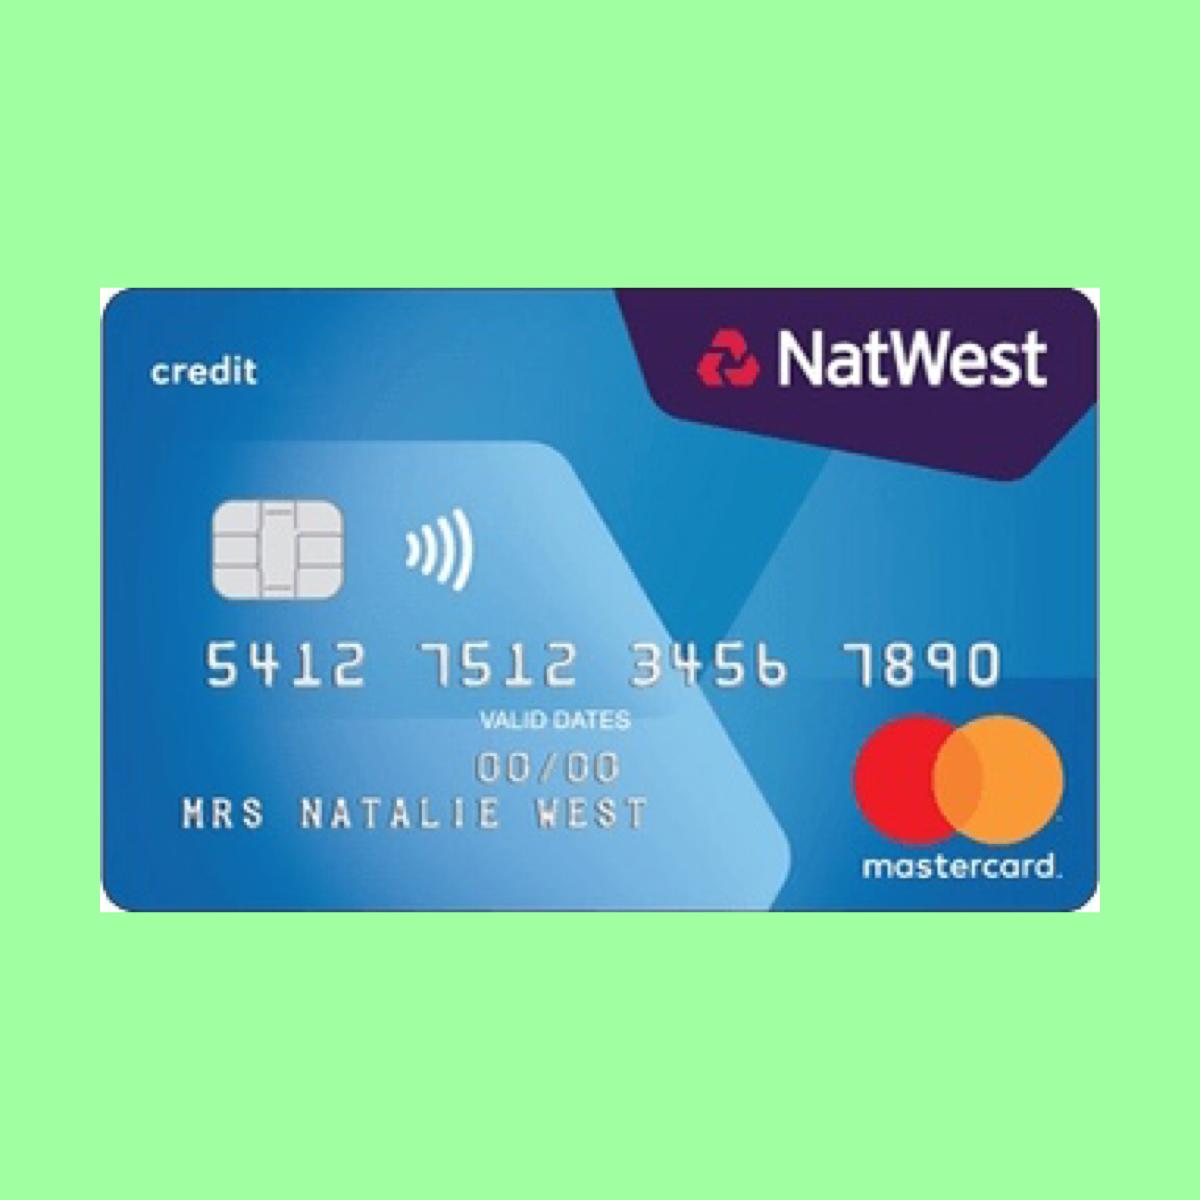 Natwest Reward Credit Card The Point Calculator Rewards Credit Cards Credit Card Points Credit Card